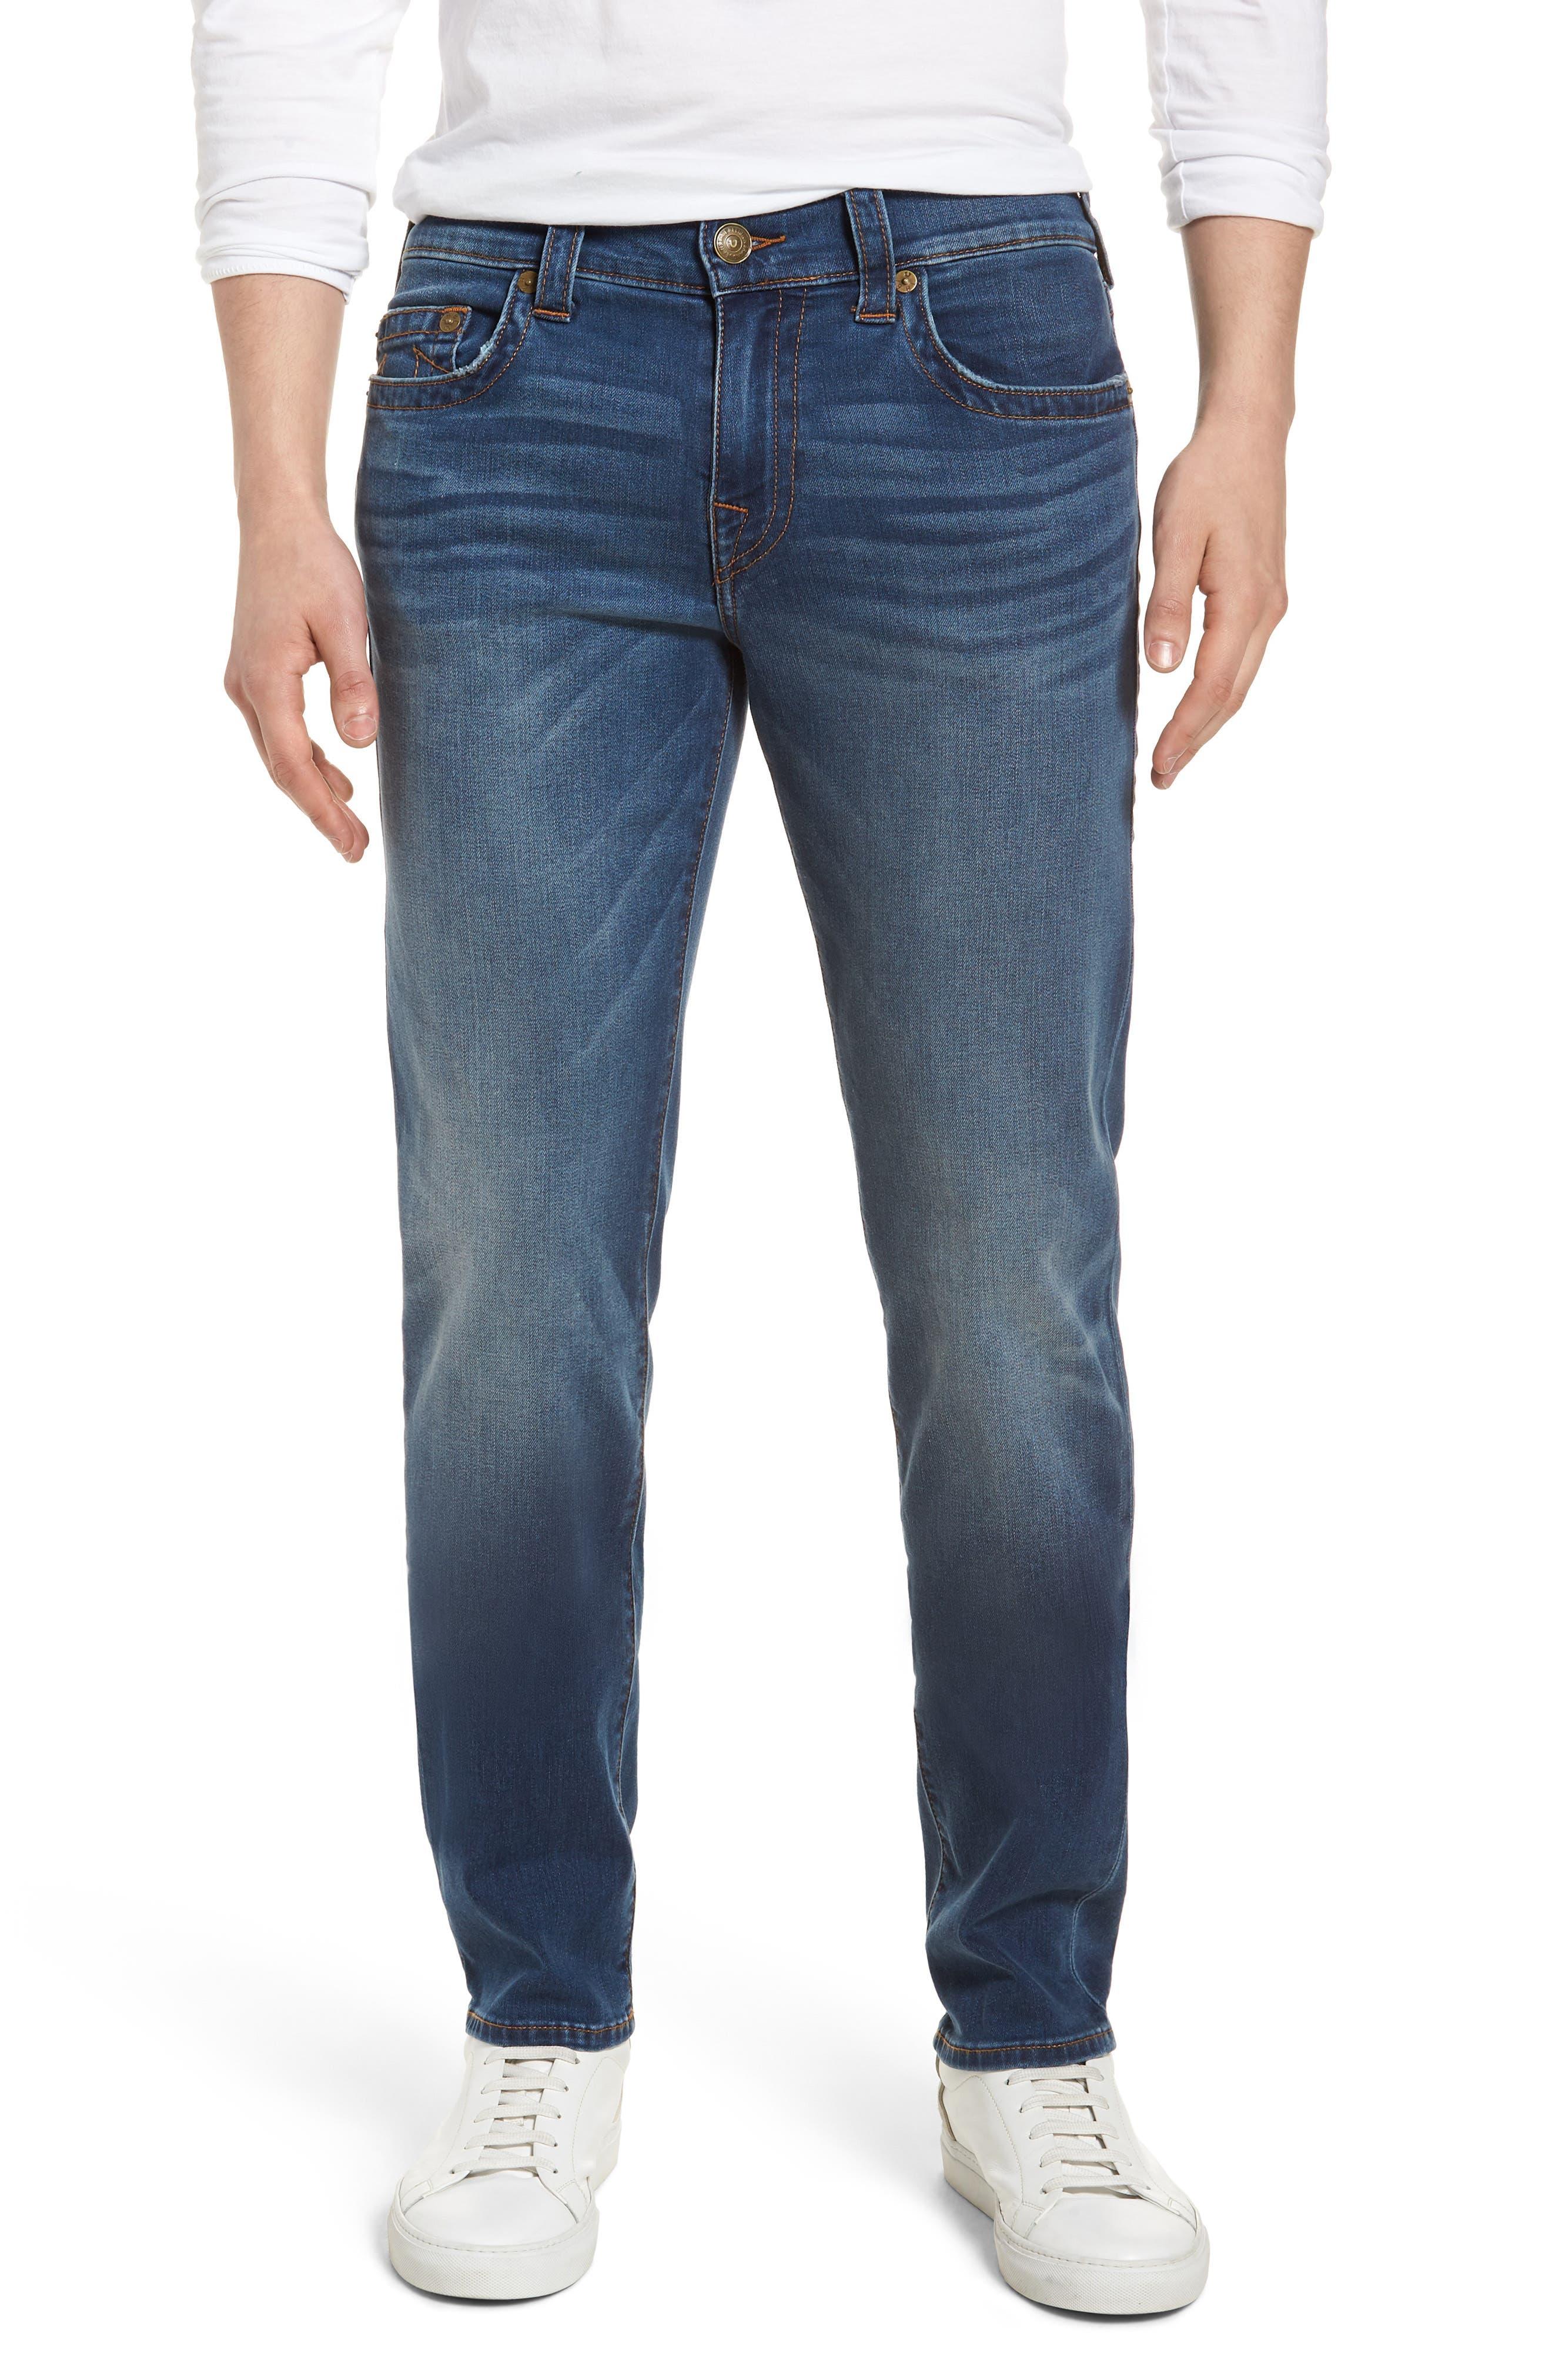 Geno Straight Leg Jeans,                             Main thumbnail 1, color,                             INDIGO LAKE